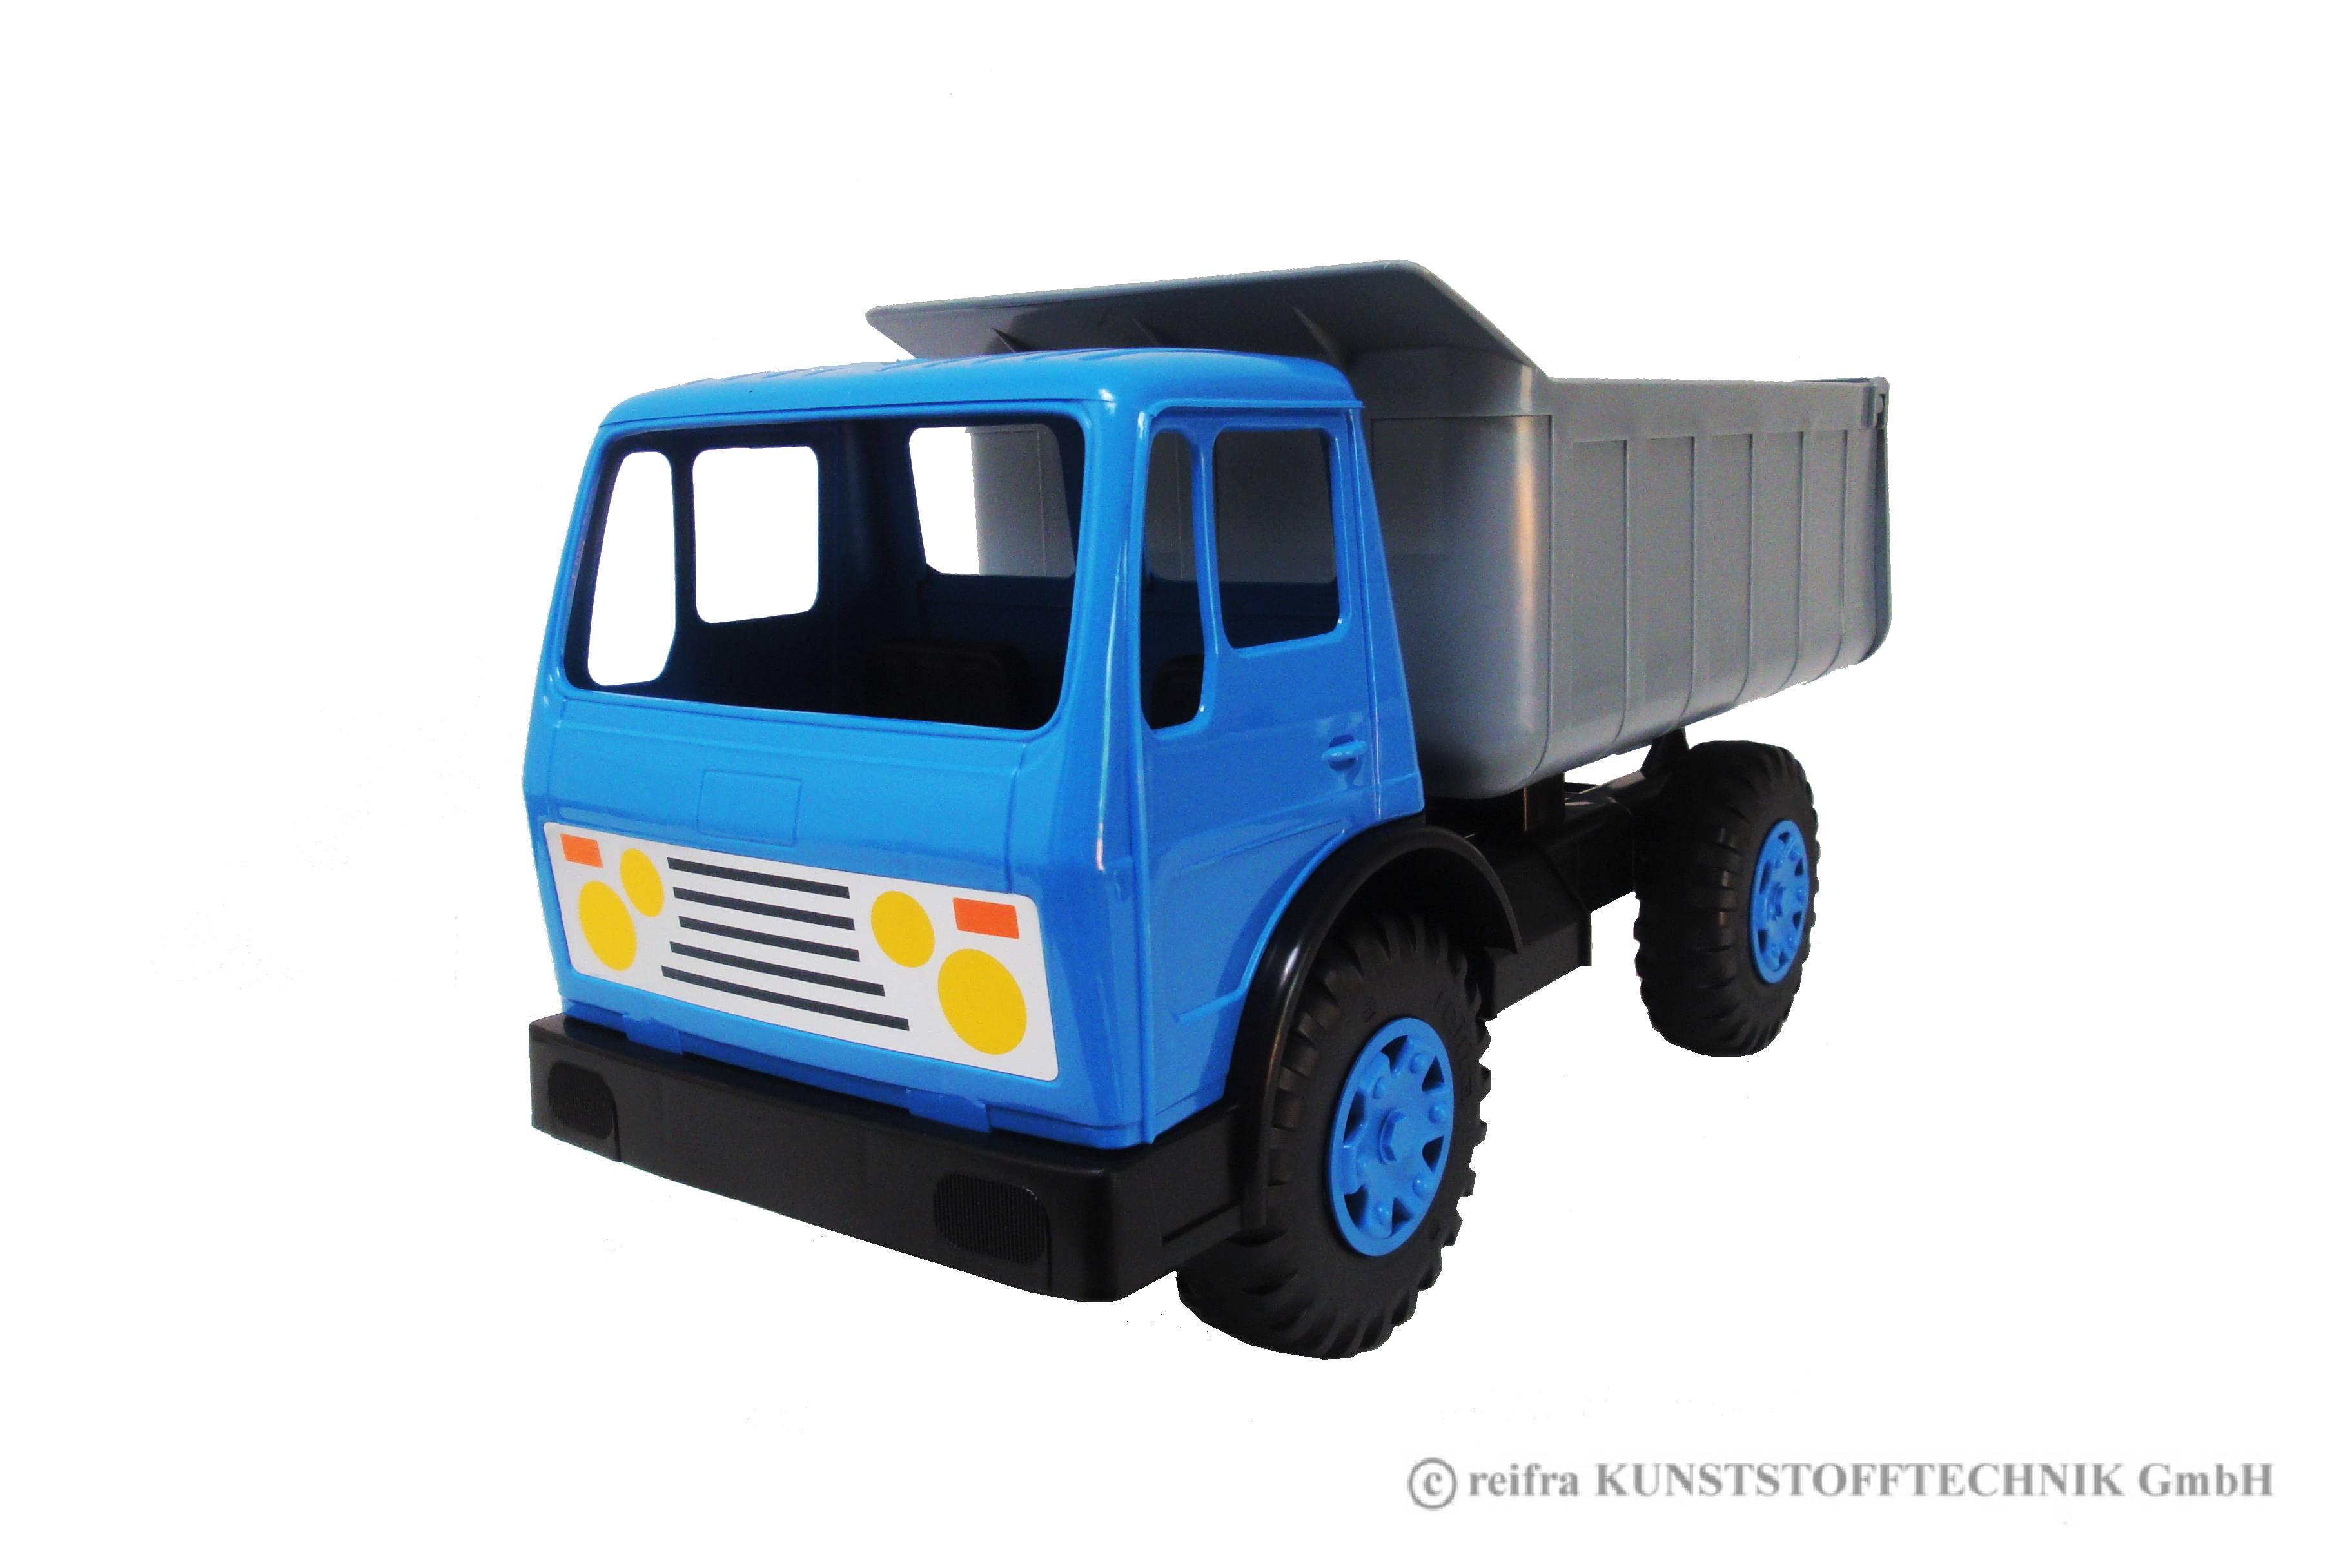 Lkw kipper ddr kinderspielzeug plasticart spielzeugautos